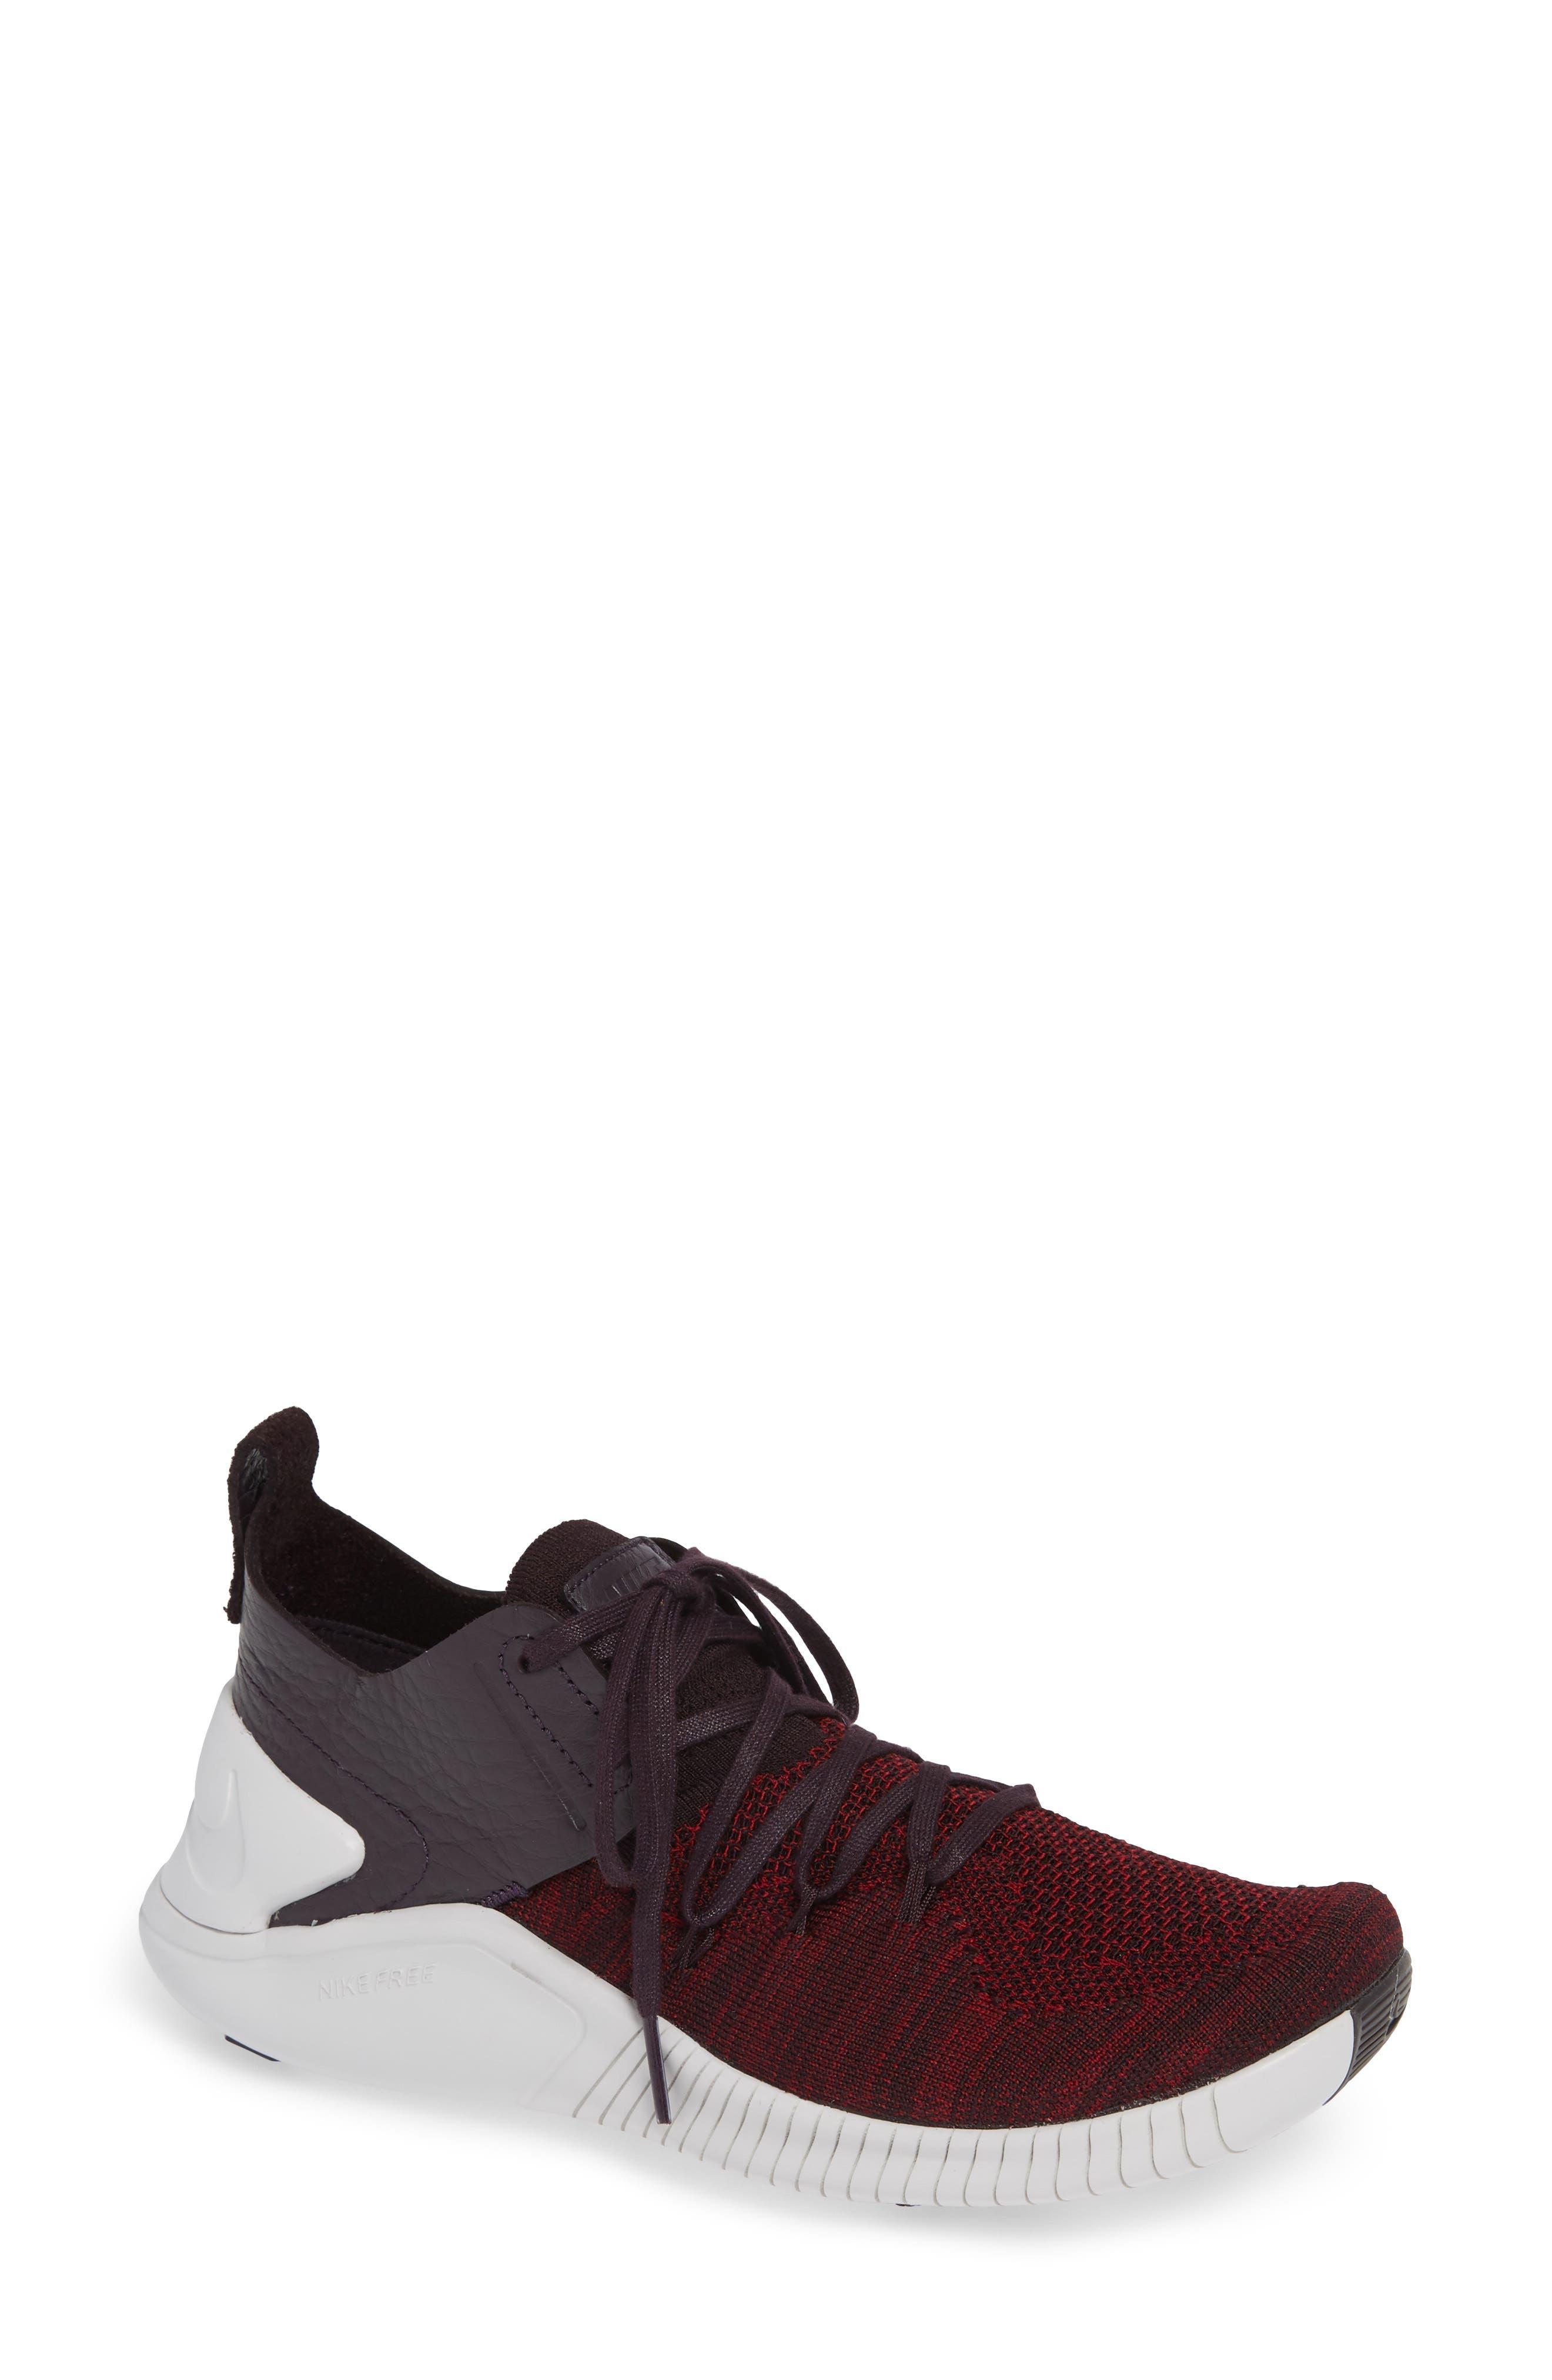 Free TR Flyknit 3 Training Shoe,                             Main thumbnail 1, color,                             BURGUNDY ASH/ VAST GREY